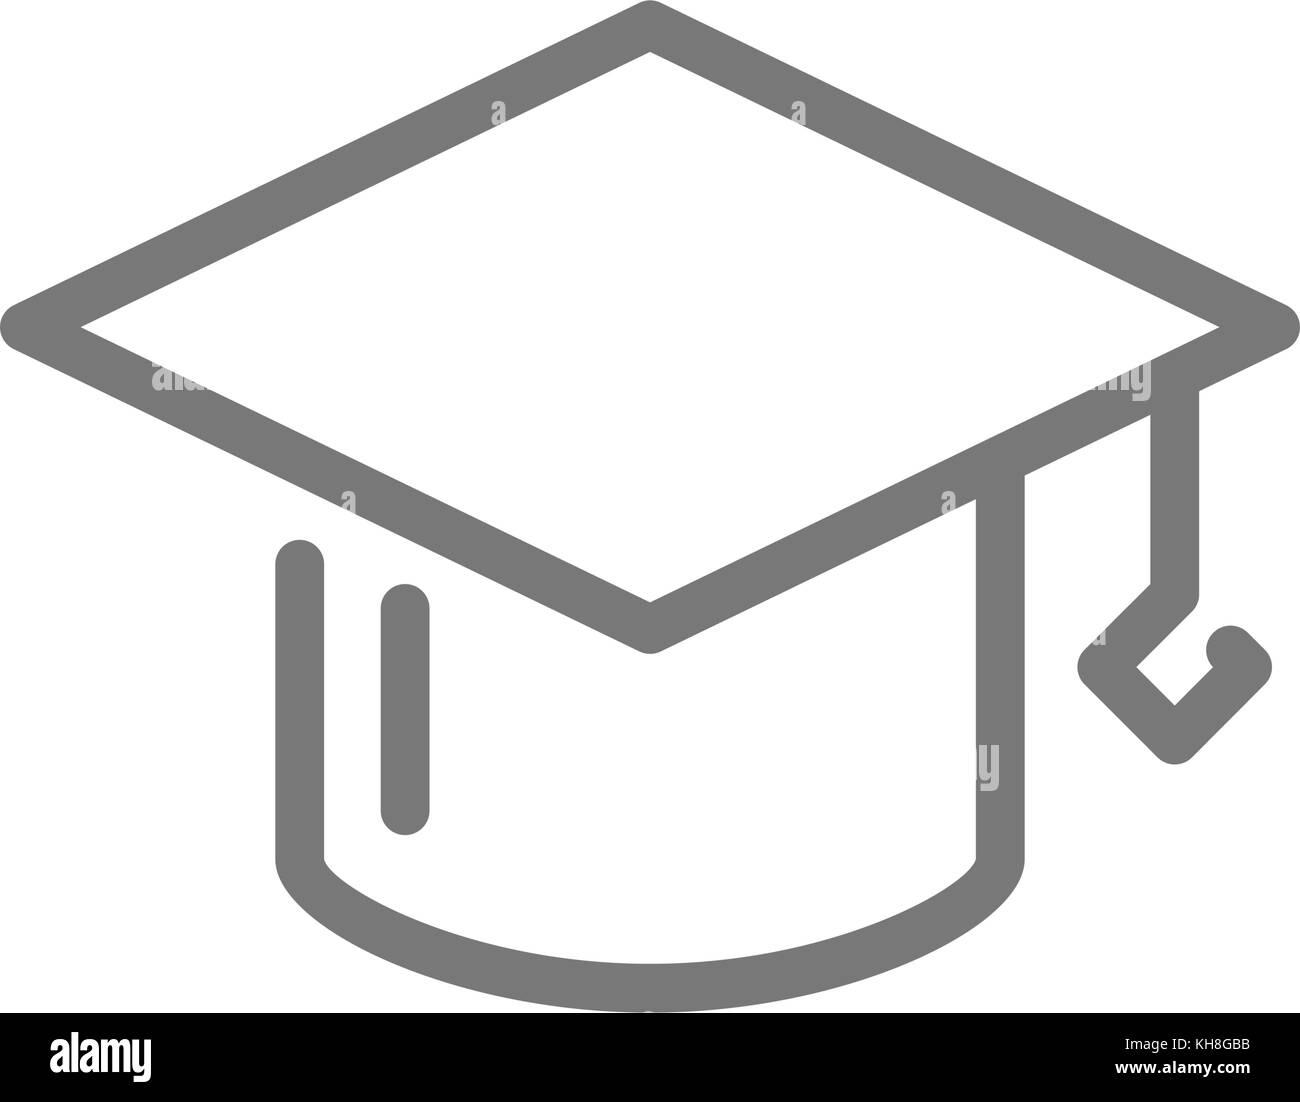 graduation symbol stock photos amp graduation symbol stock